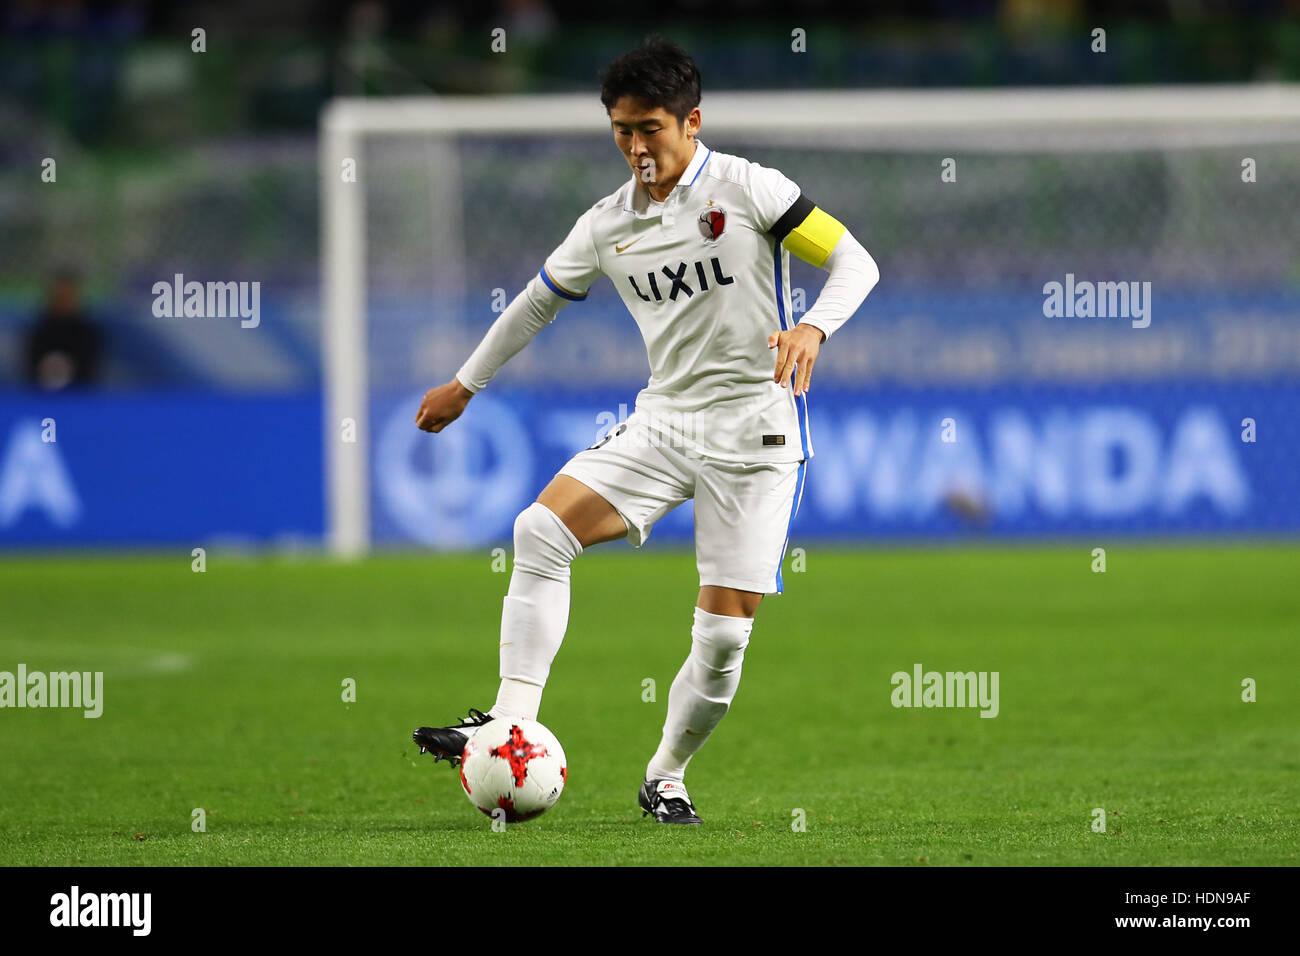 Osaka, Japan. 11th Dec, 2016. Ryota Nagaki (Antlers) Football/Soccer : FIFA Club World Cup Japan 2016 Quarter-final - Stock Image